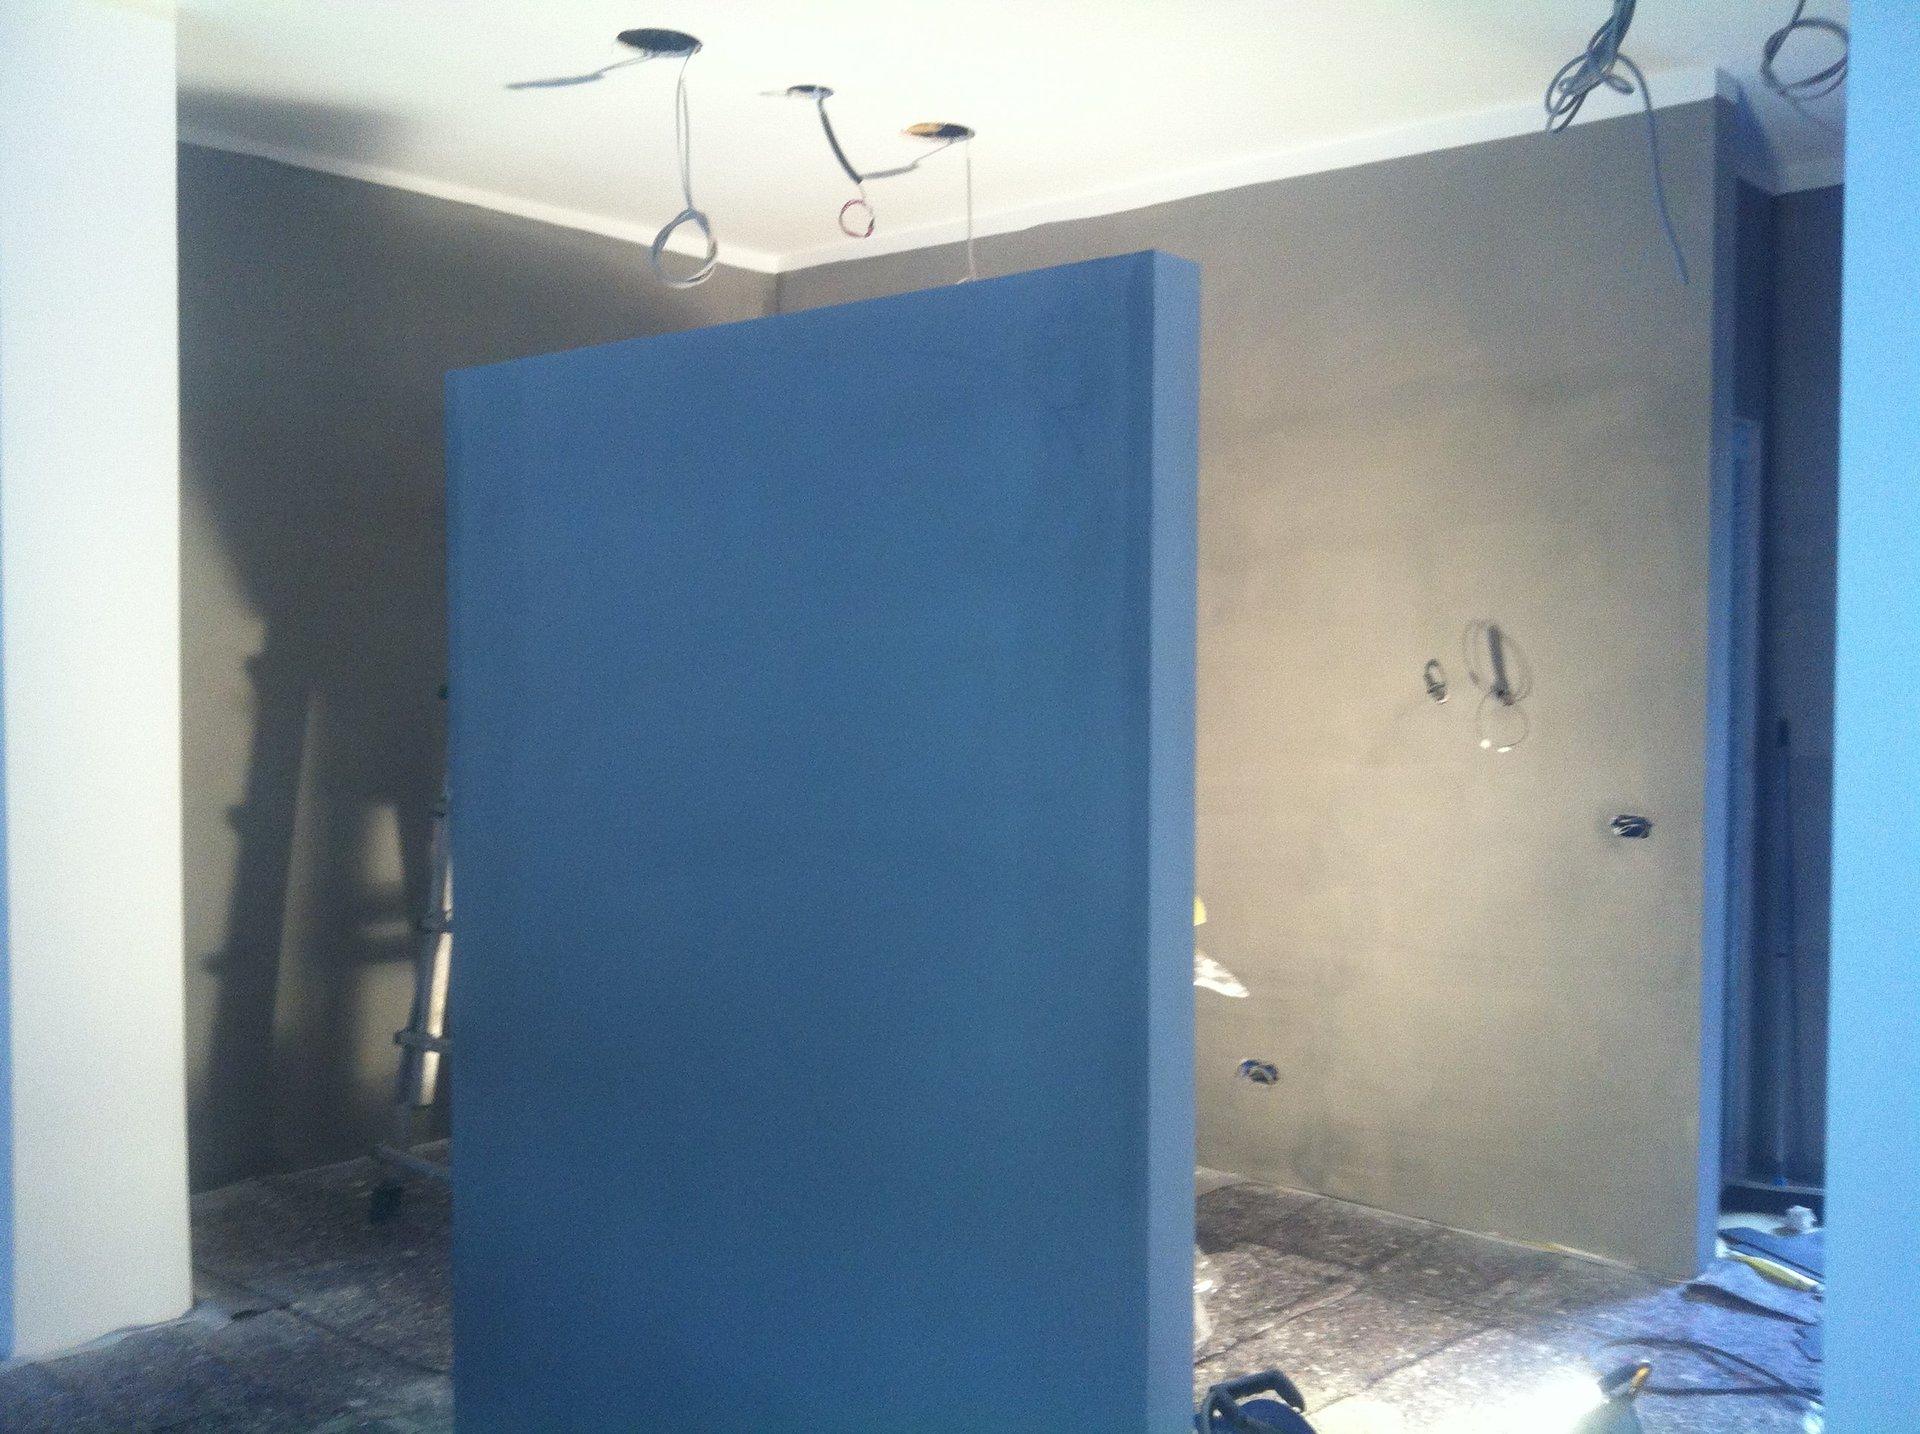 una parete di colore blue